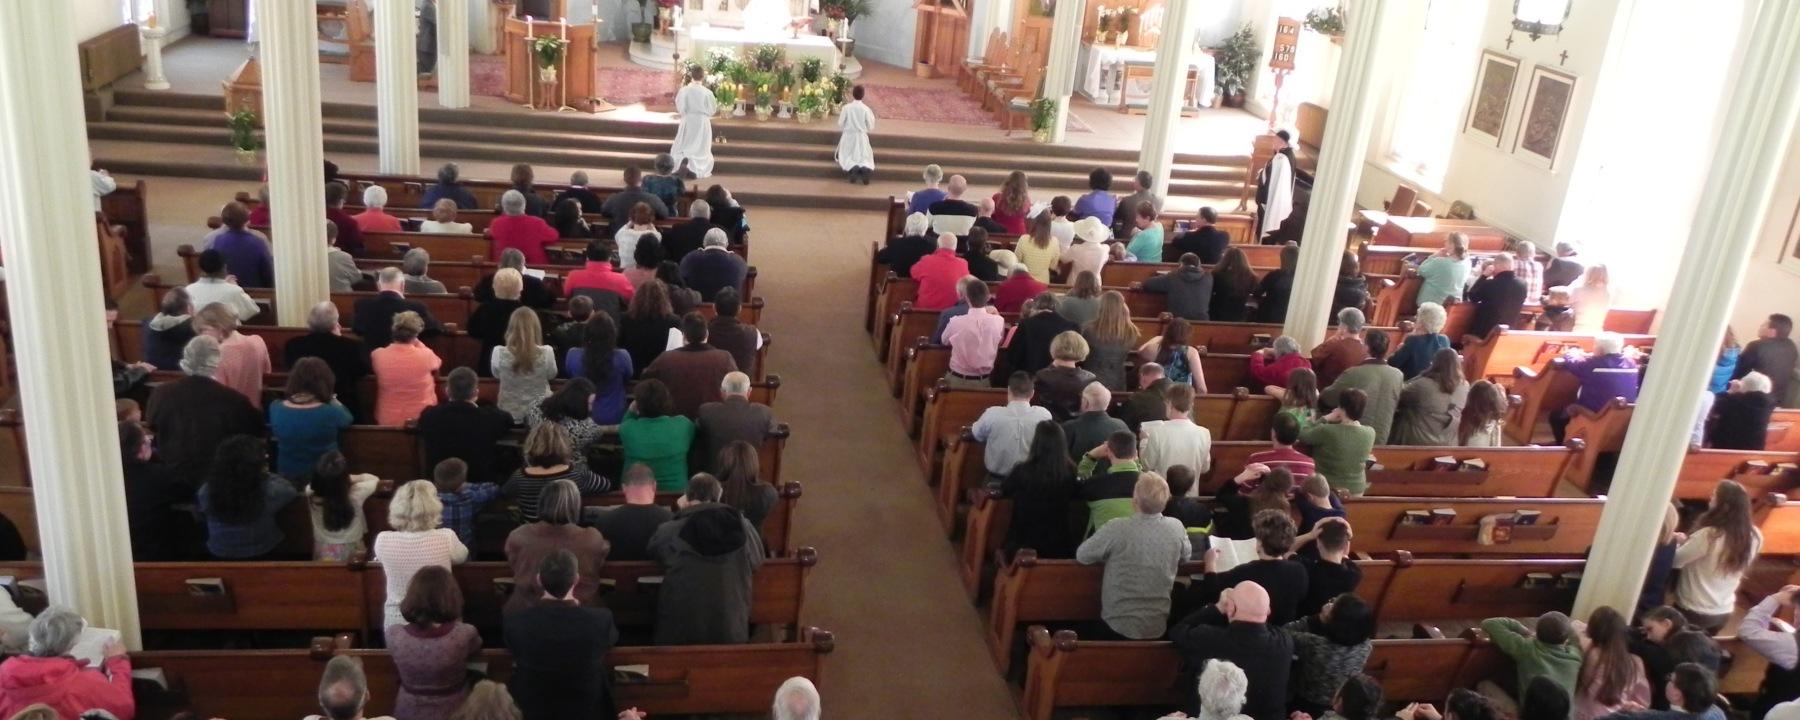 Church, row, worship, congregation, Catholics, pews